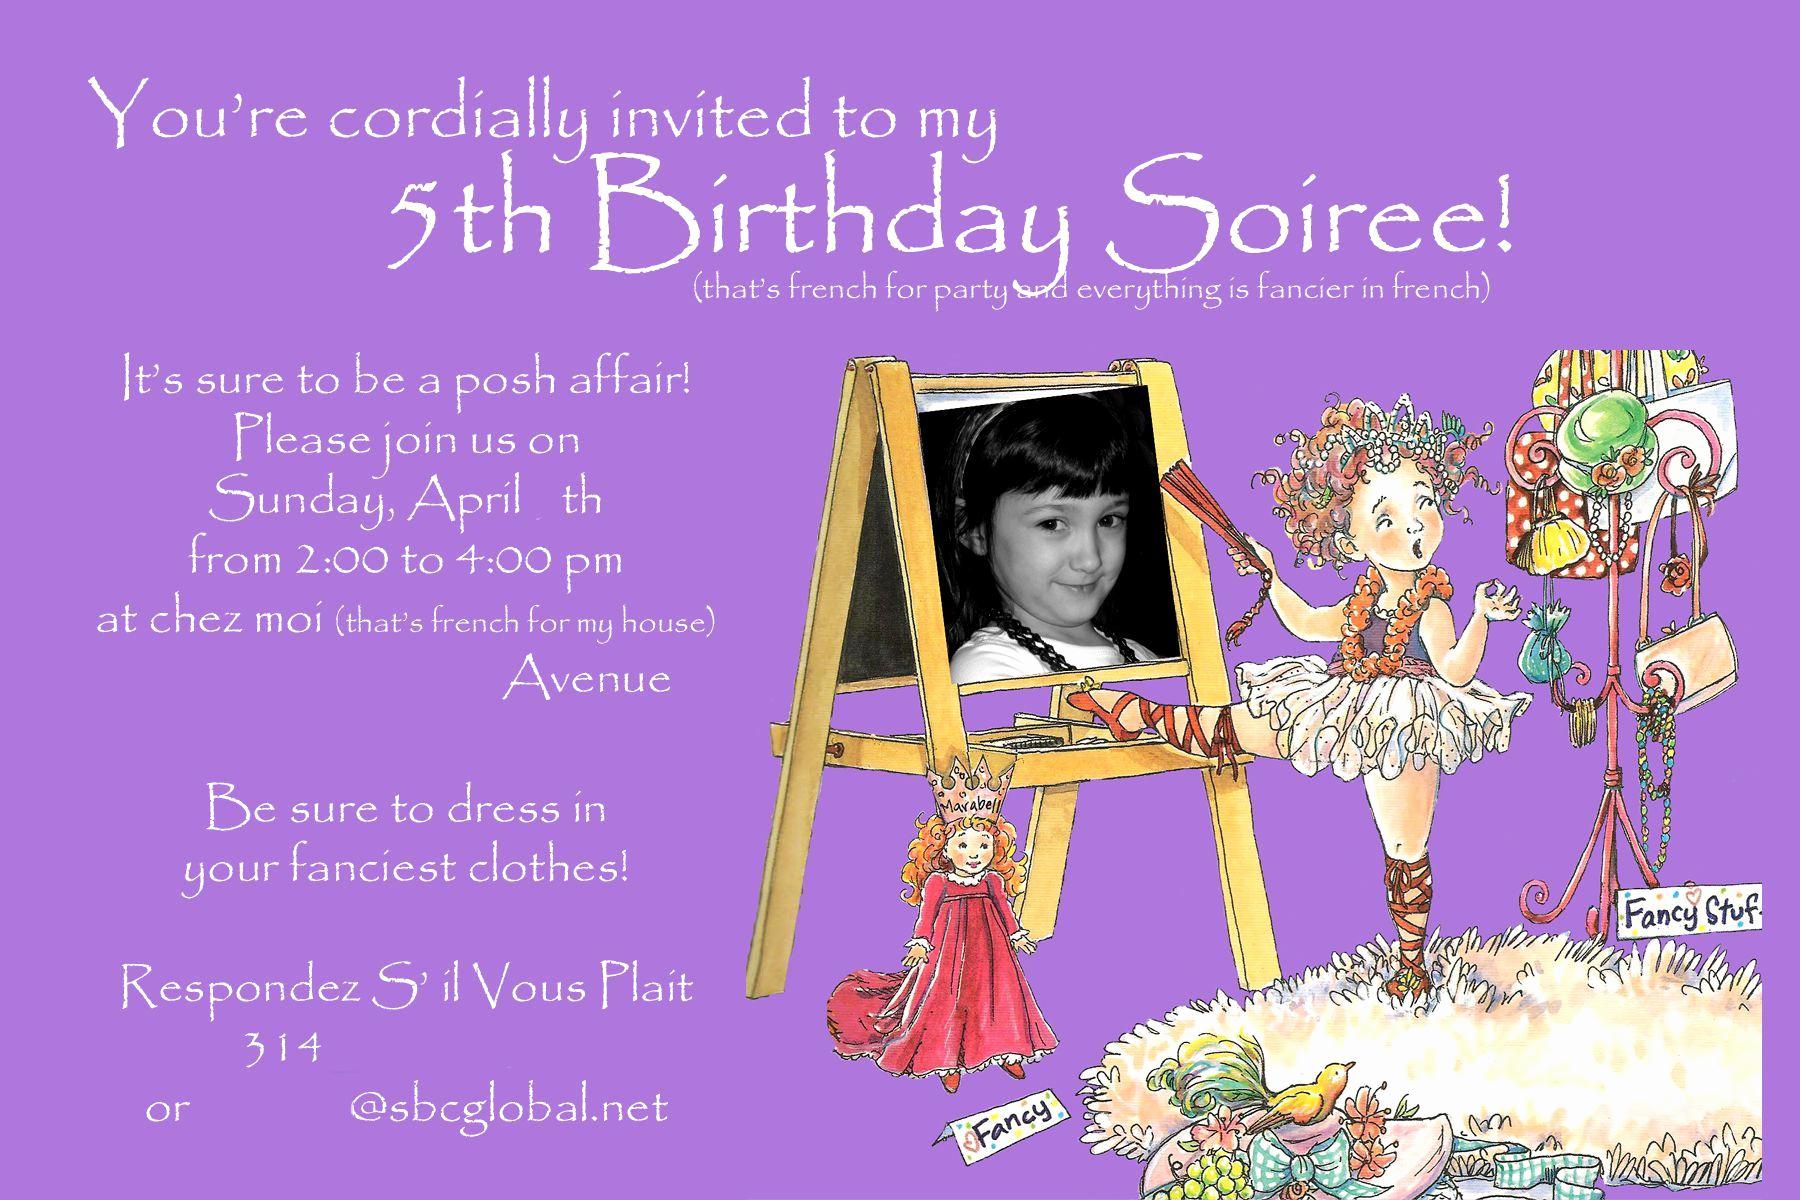 5th Birthday Party Invitation Beautiful Birthday Invitation Card Maker Free